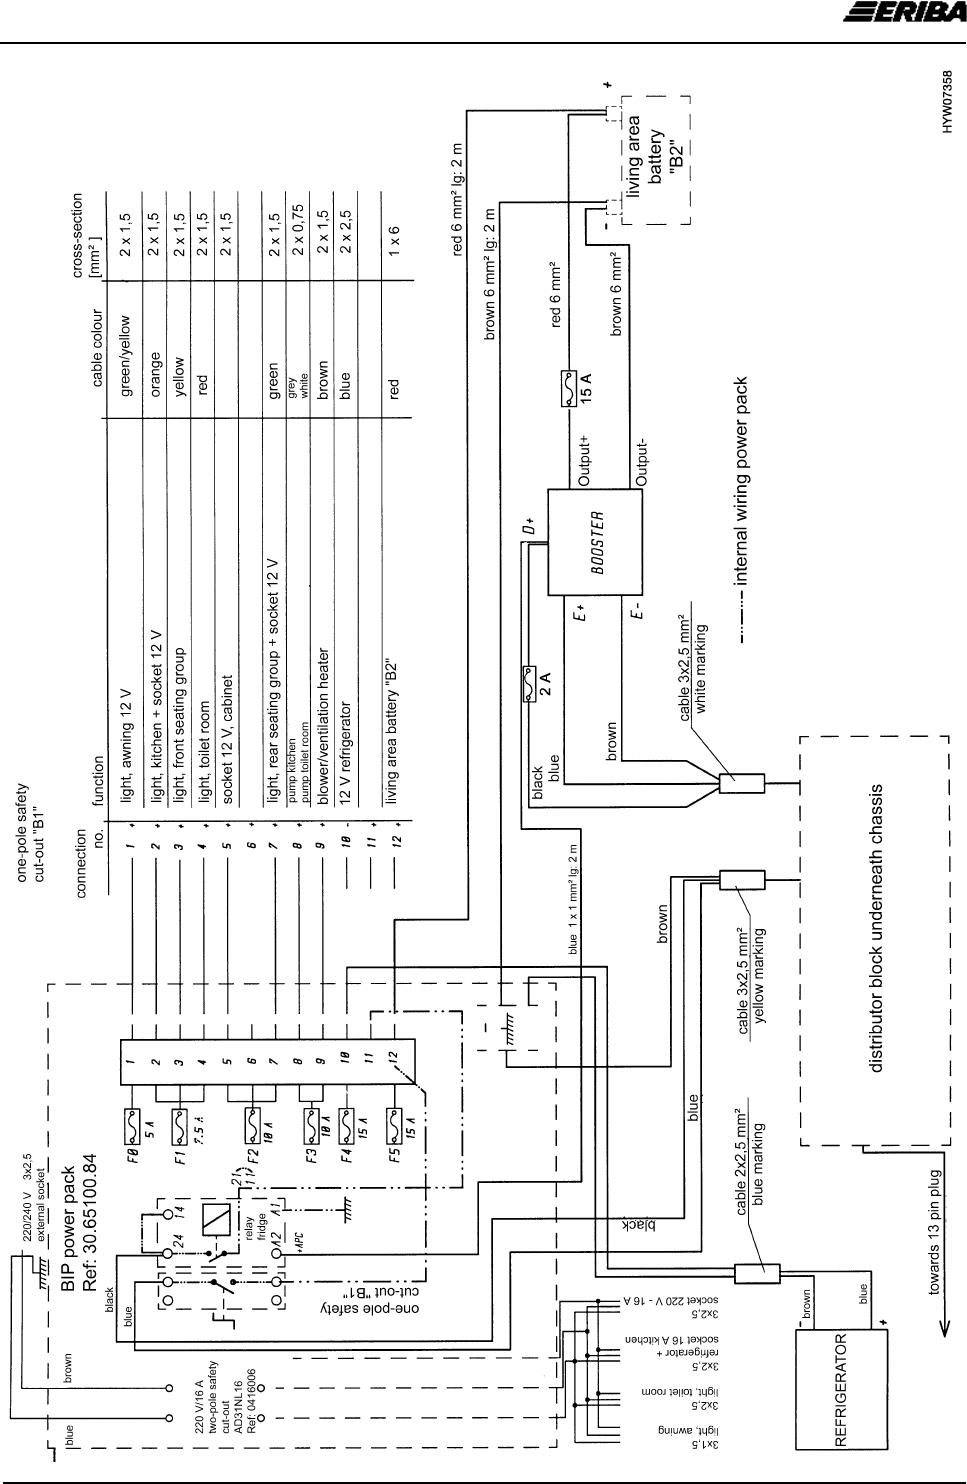 Manual Hymer Eriba (page 158 of 164) (English)   Hymer Caravan Wiring Diagram      Libble.eu